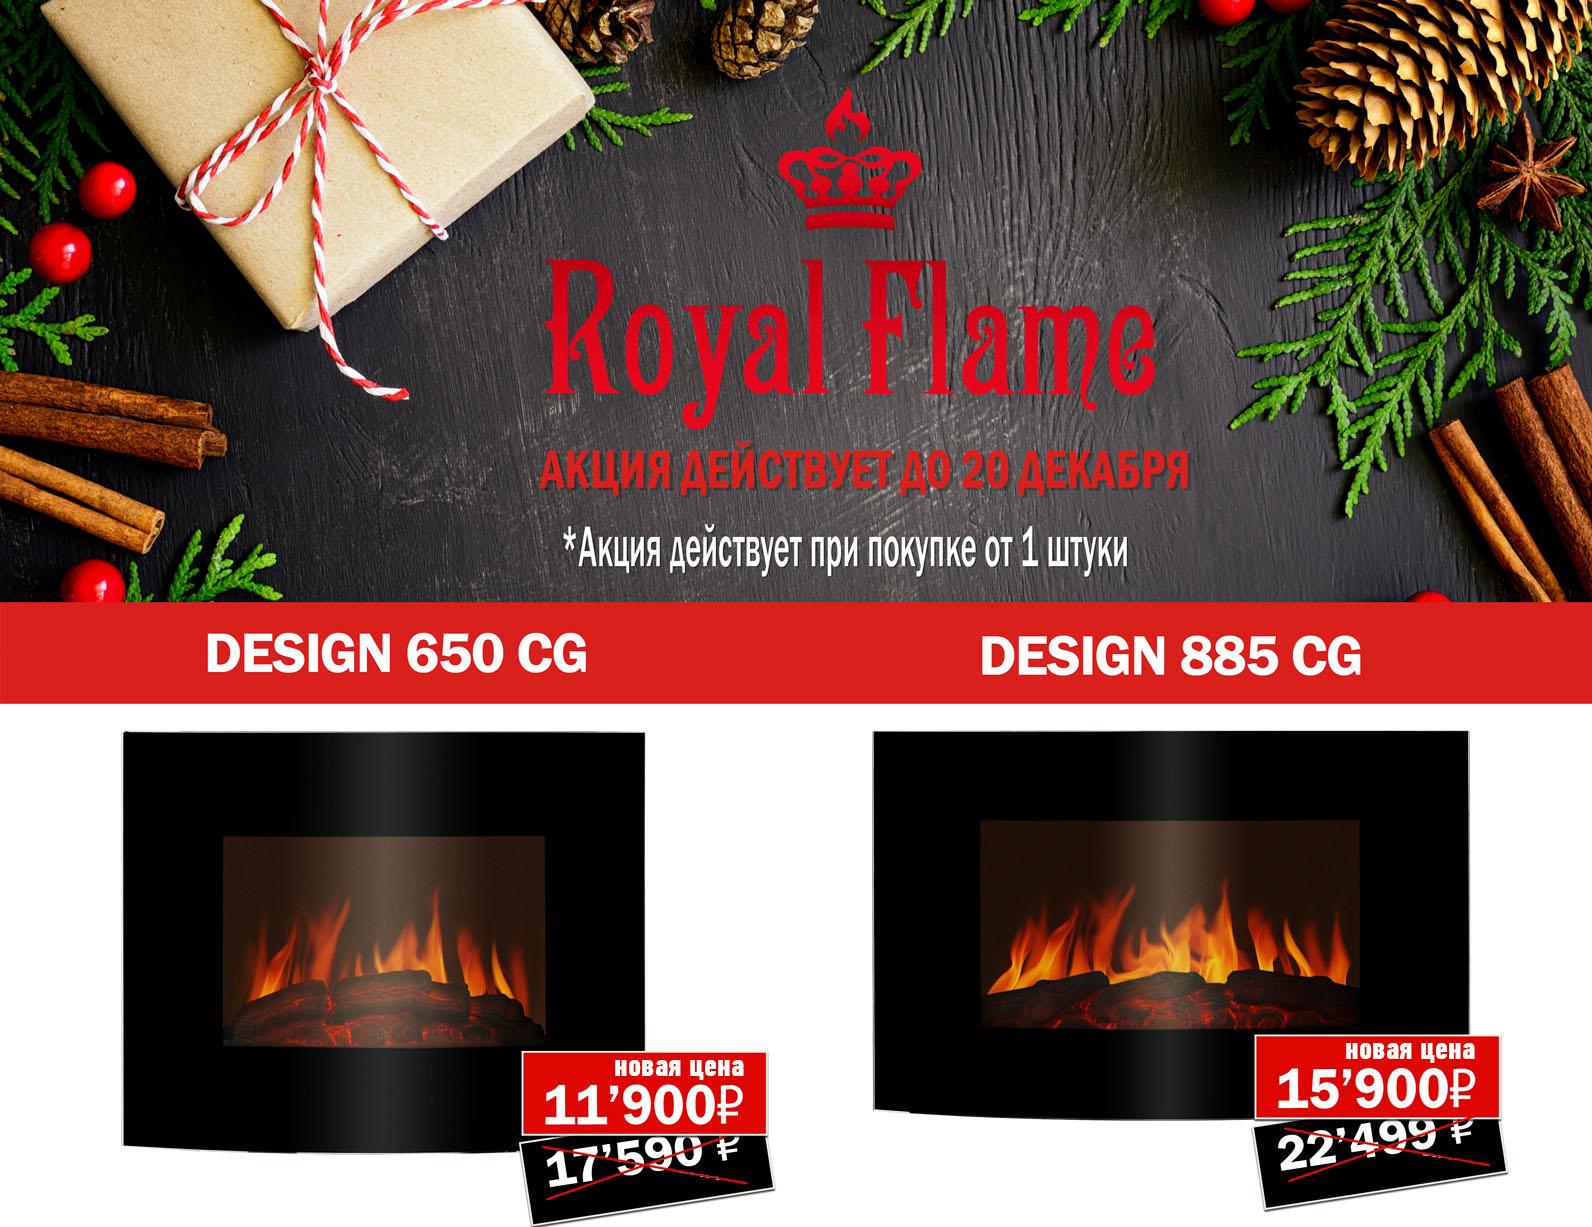 скидки на Royal Flame design